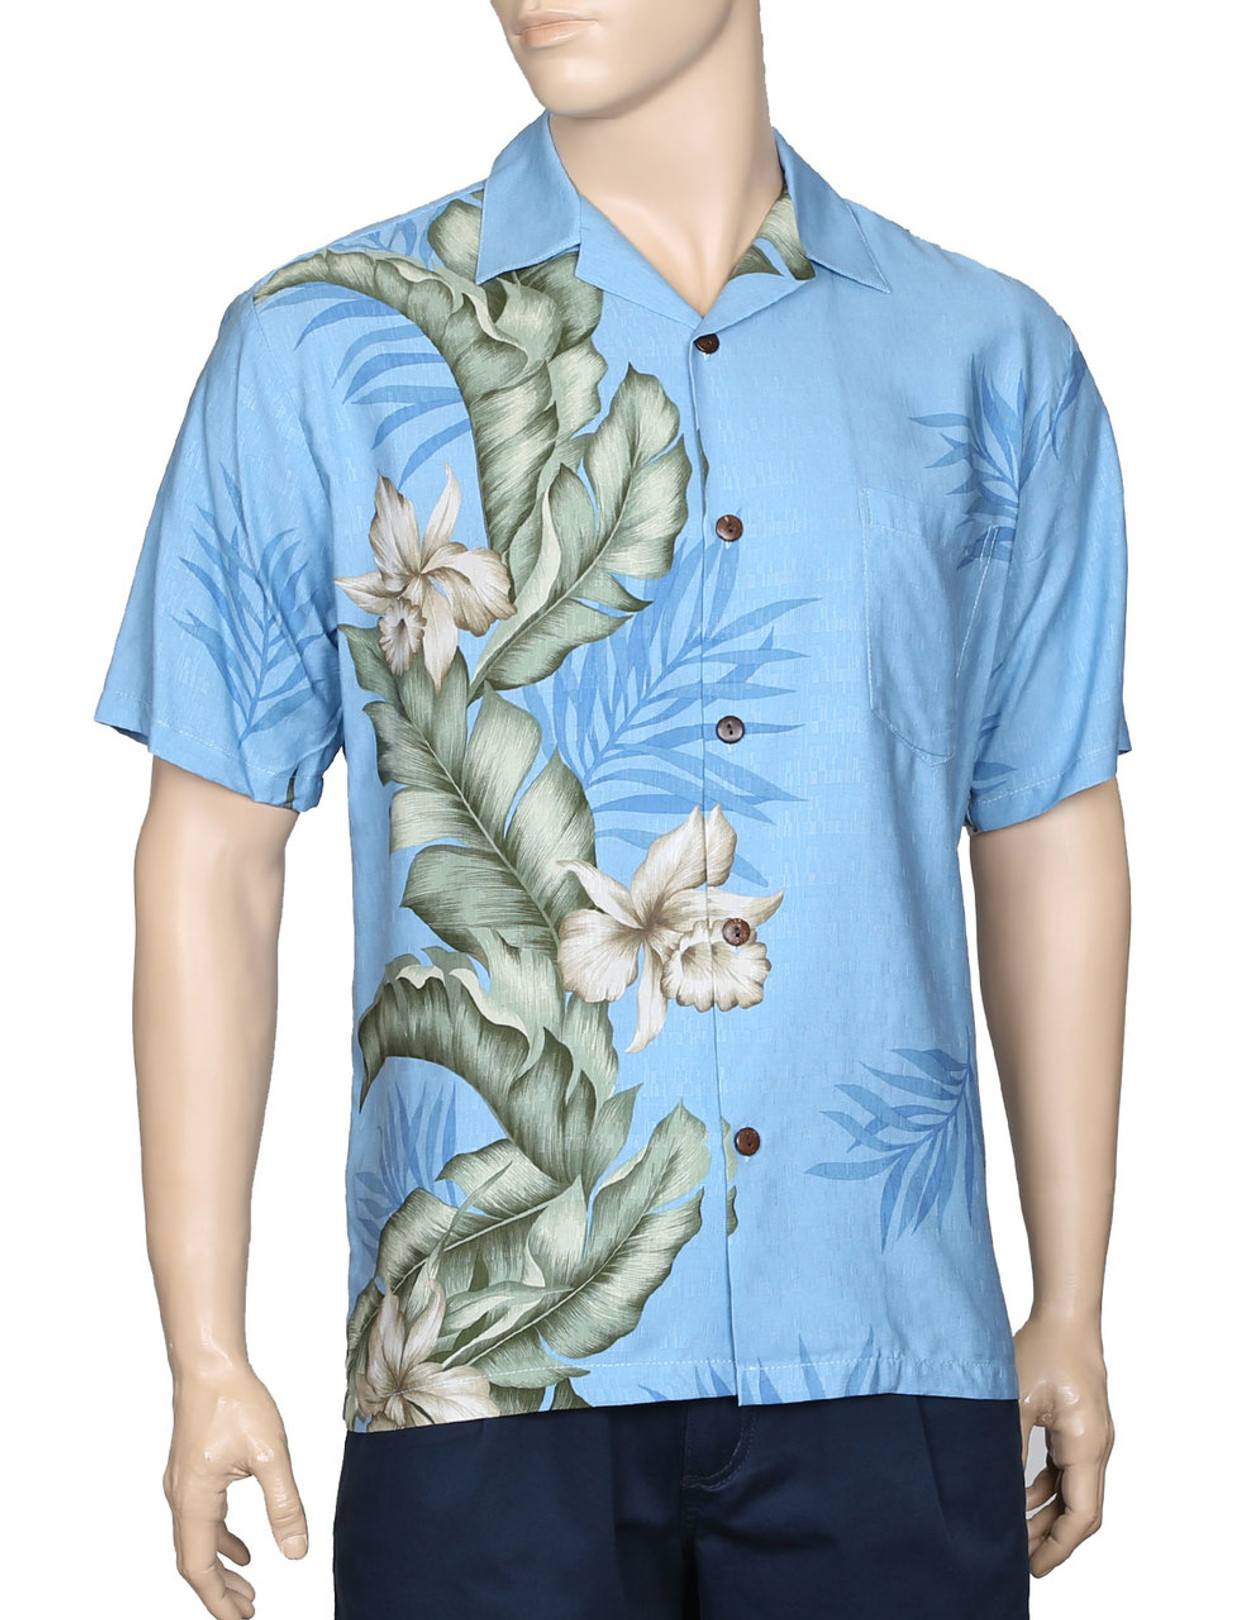 38f78af6b0 White Orchids Hawaiian Elegant Shirt